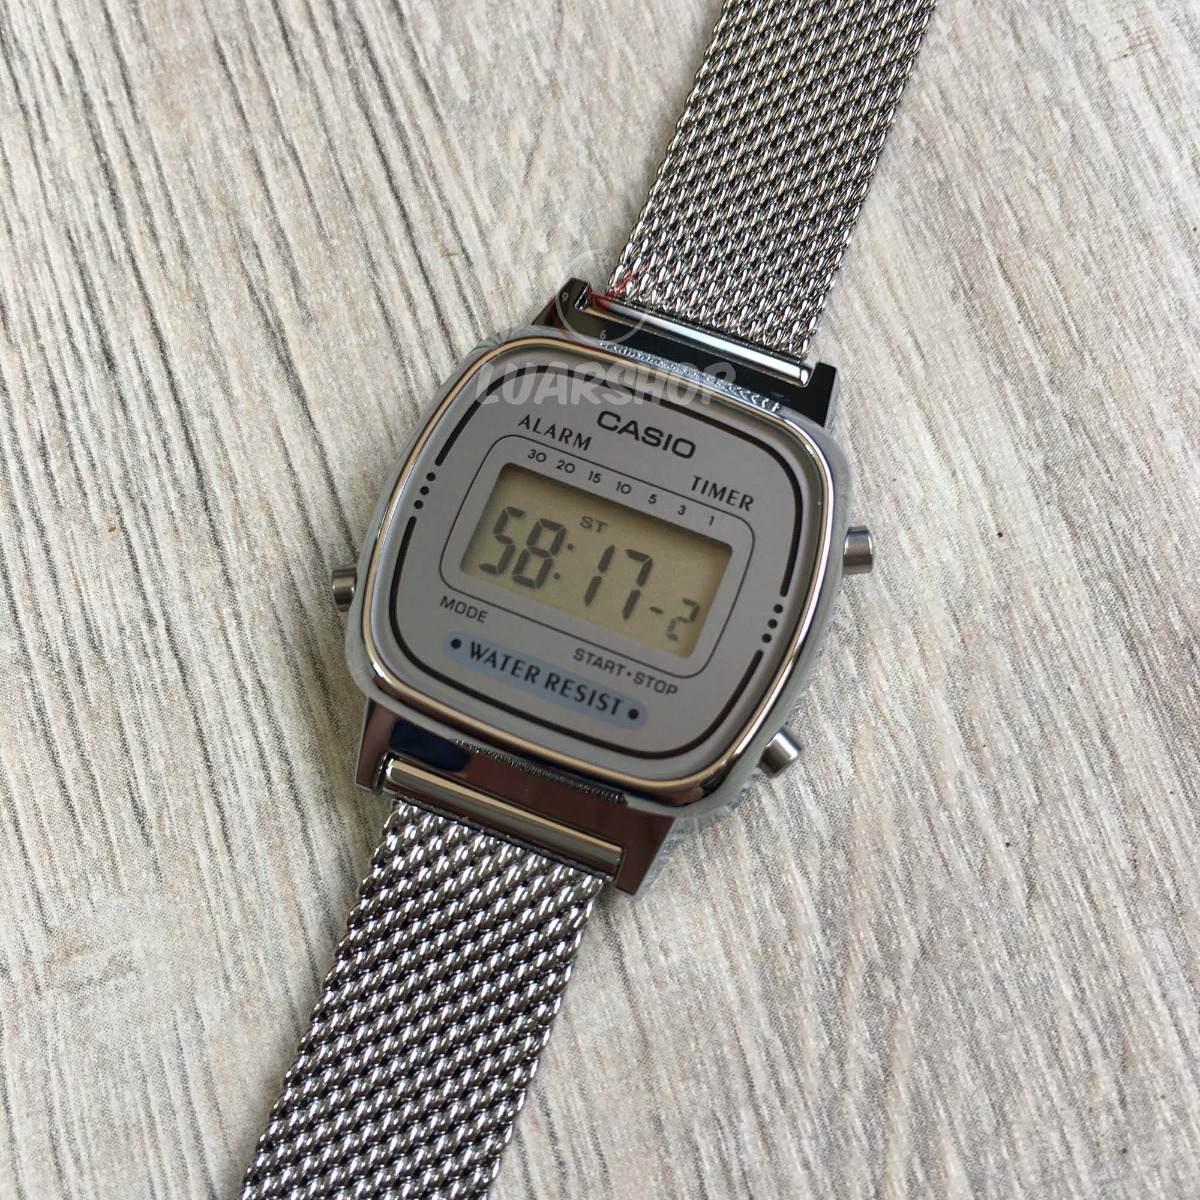 1b2c626b143 relógio casio digital mini feminino la670wem prata original. Carregando zoom...  relógio casio mini feminino. Carregando zoom.